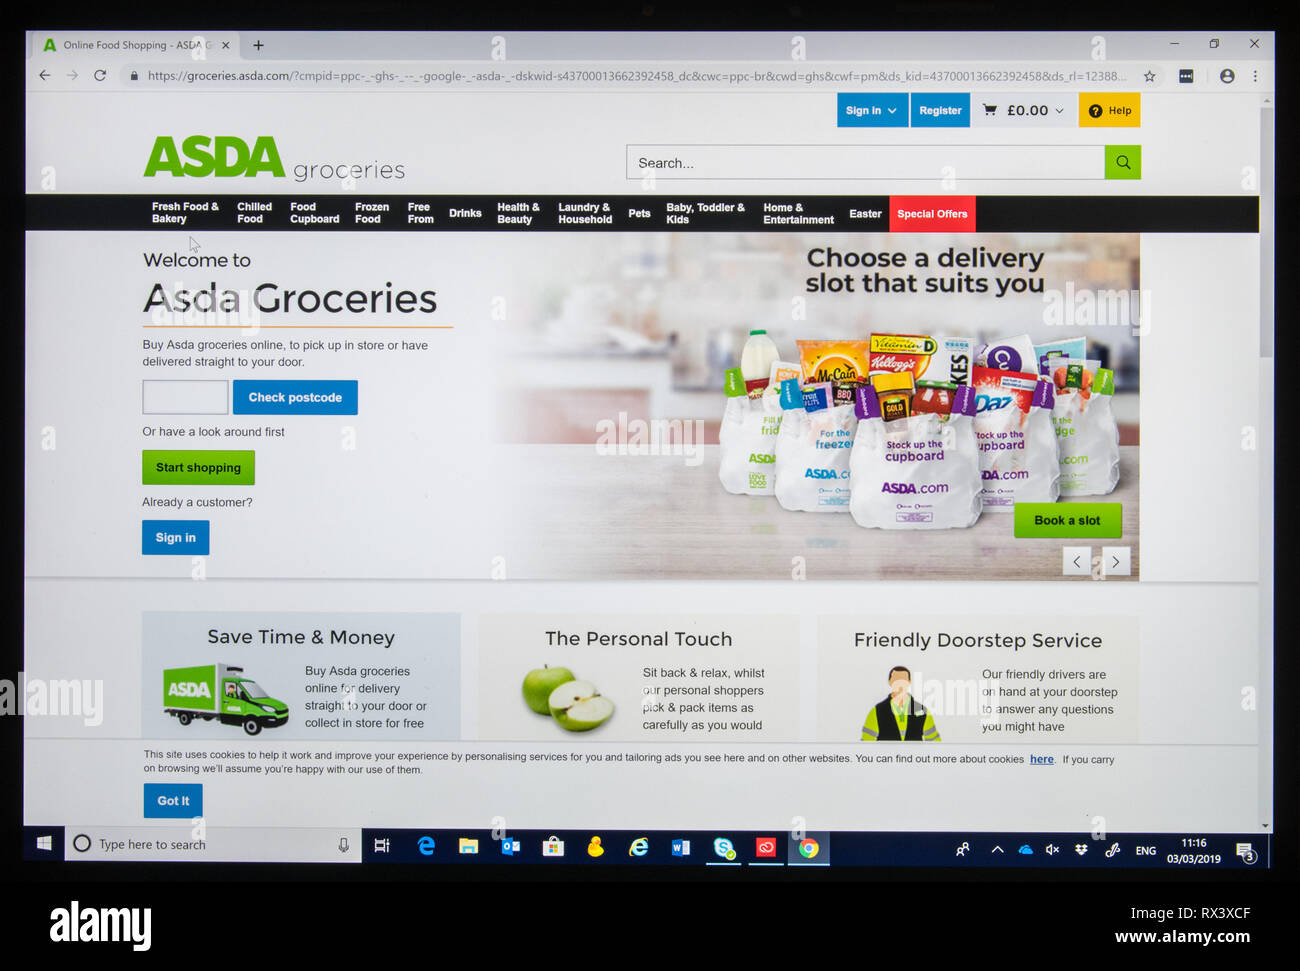 Asda comestibles tienda online captura de pantalla. Imagen De Stock